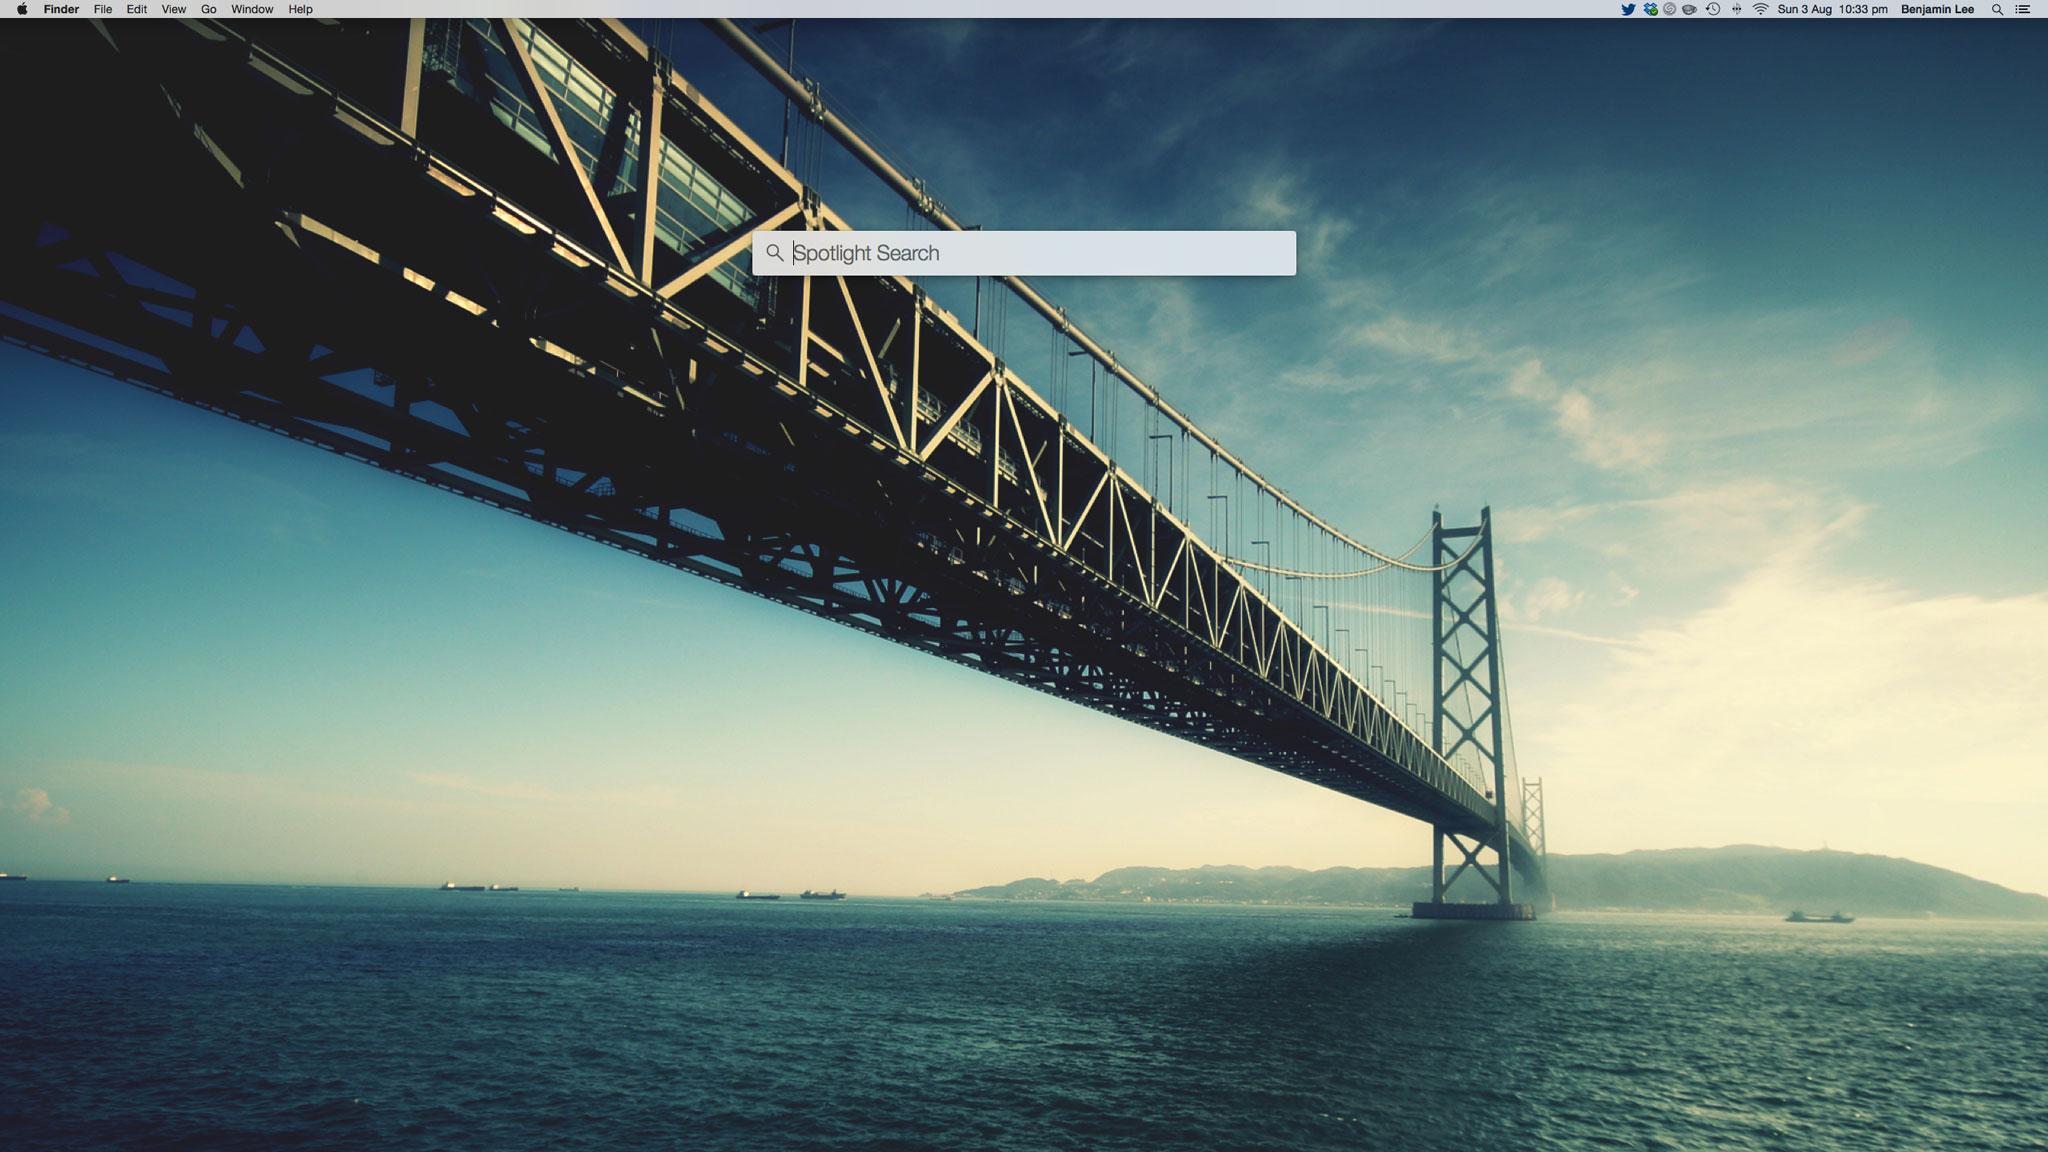 OS-X-Yosemite-Spotlight-Search-01.jpg